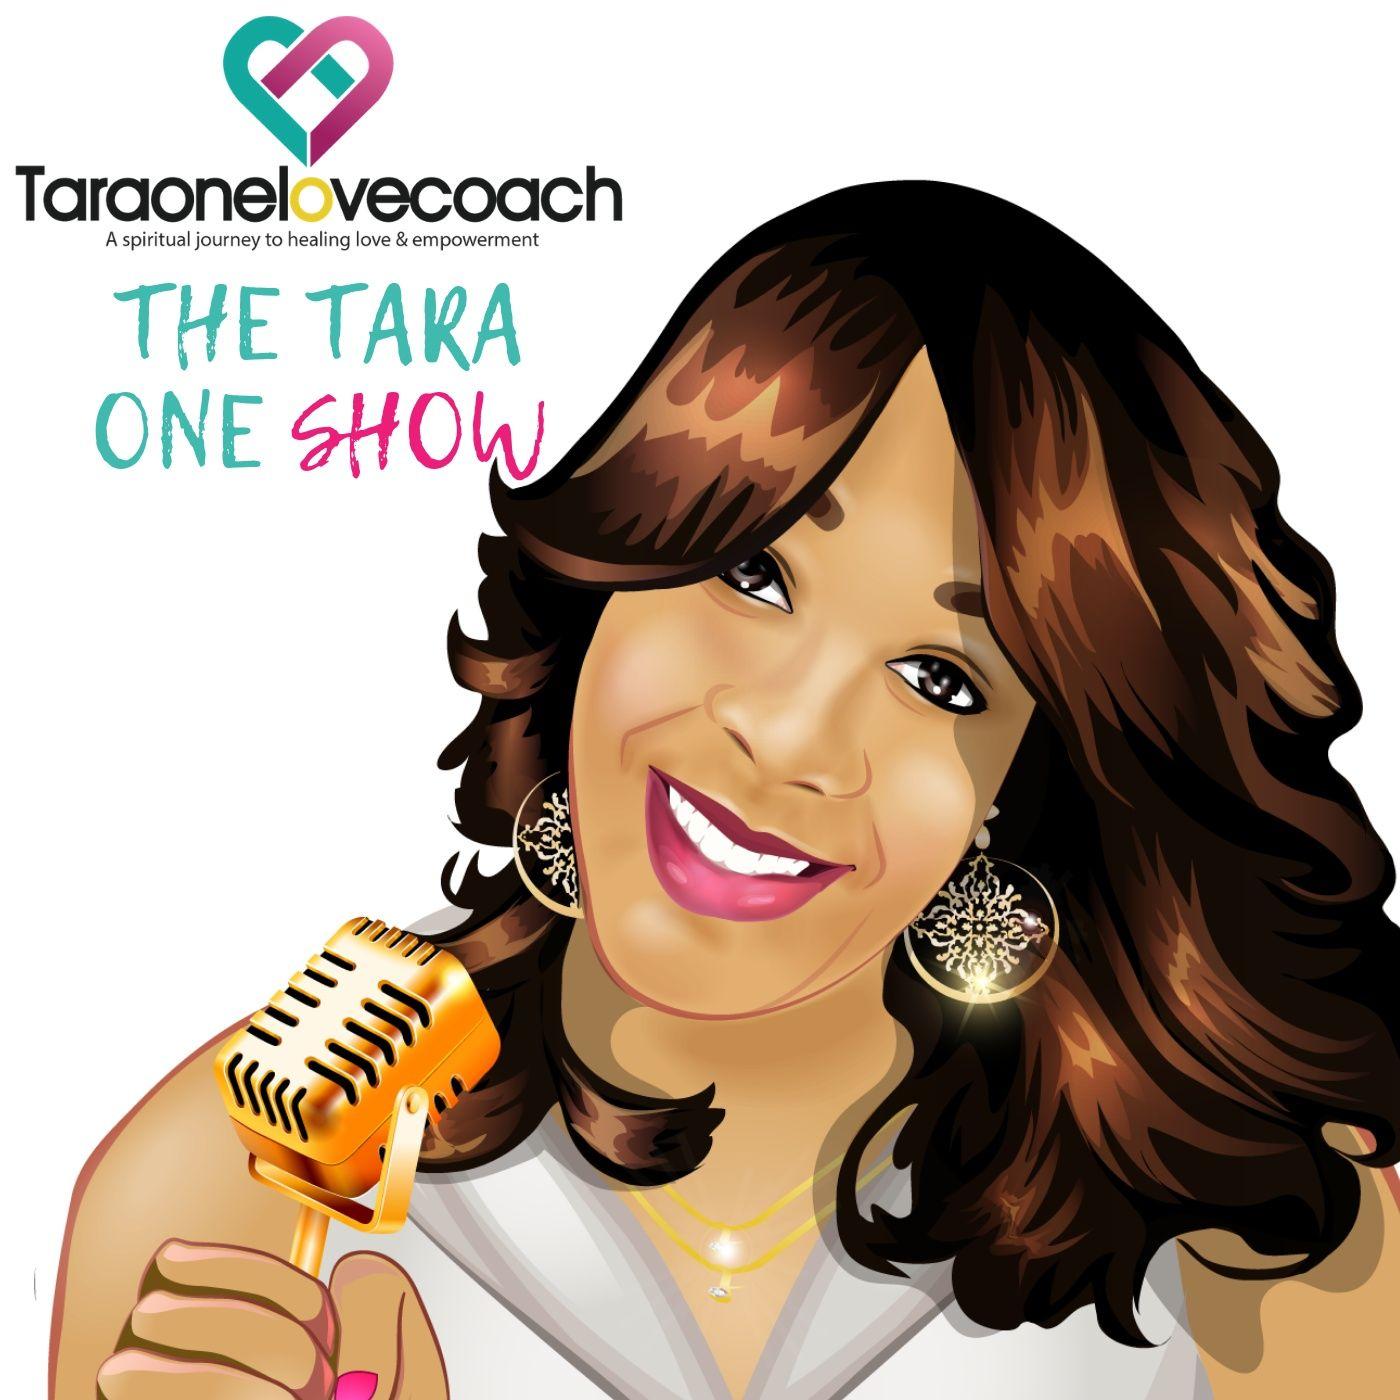 Tara One show